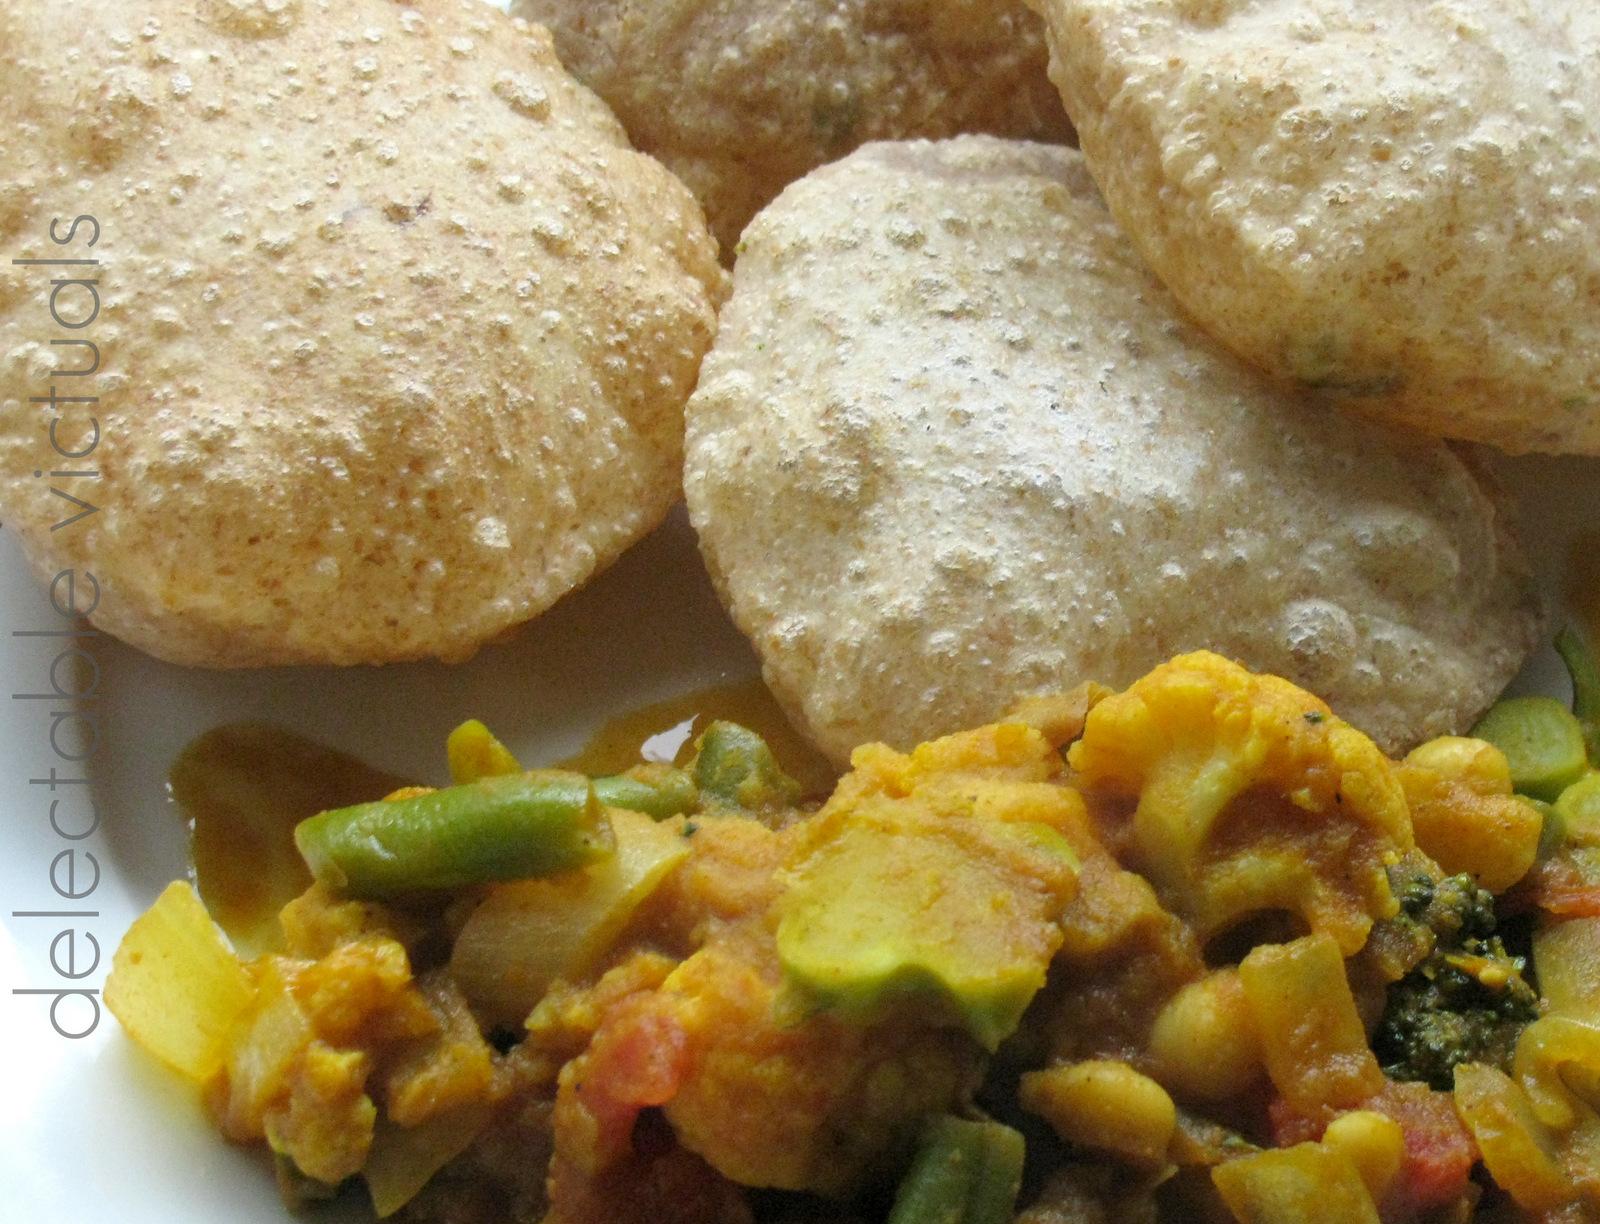 Poori Deep Fried Puffed Bread Recipe — Dishmaps